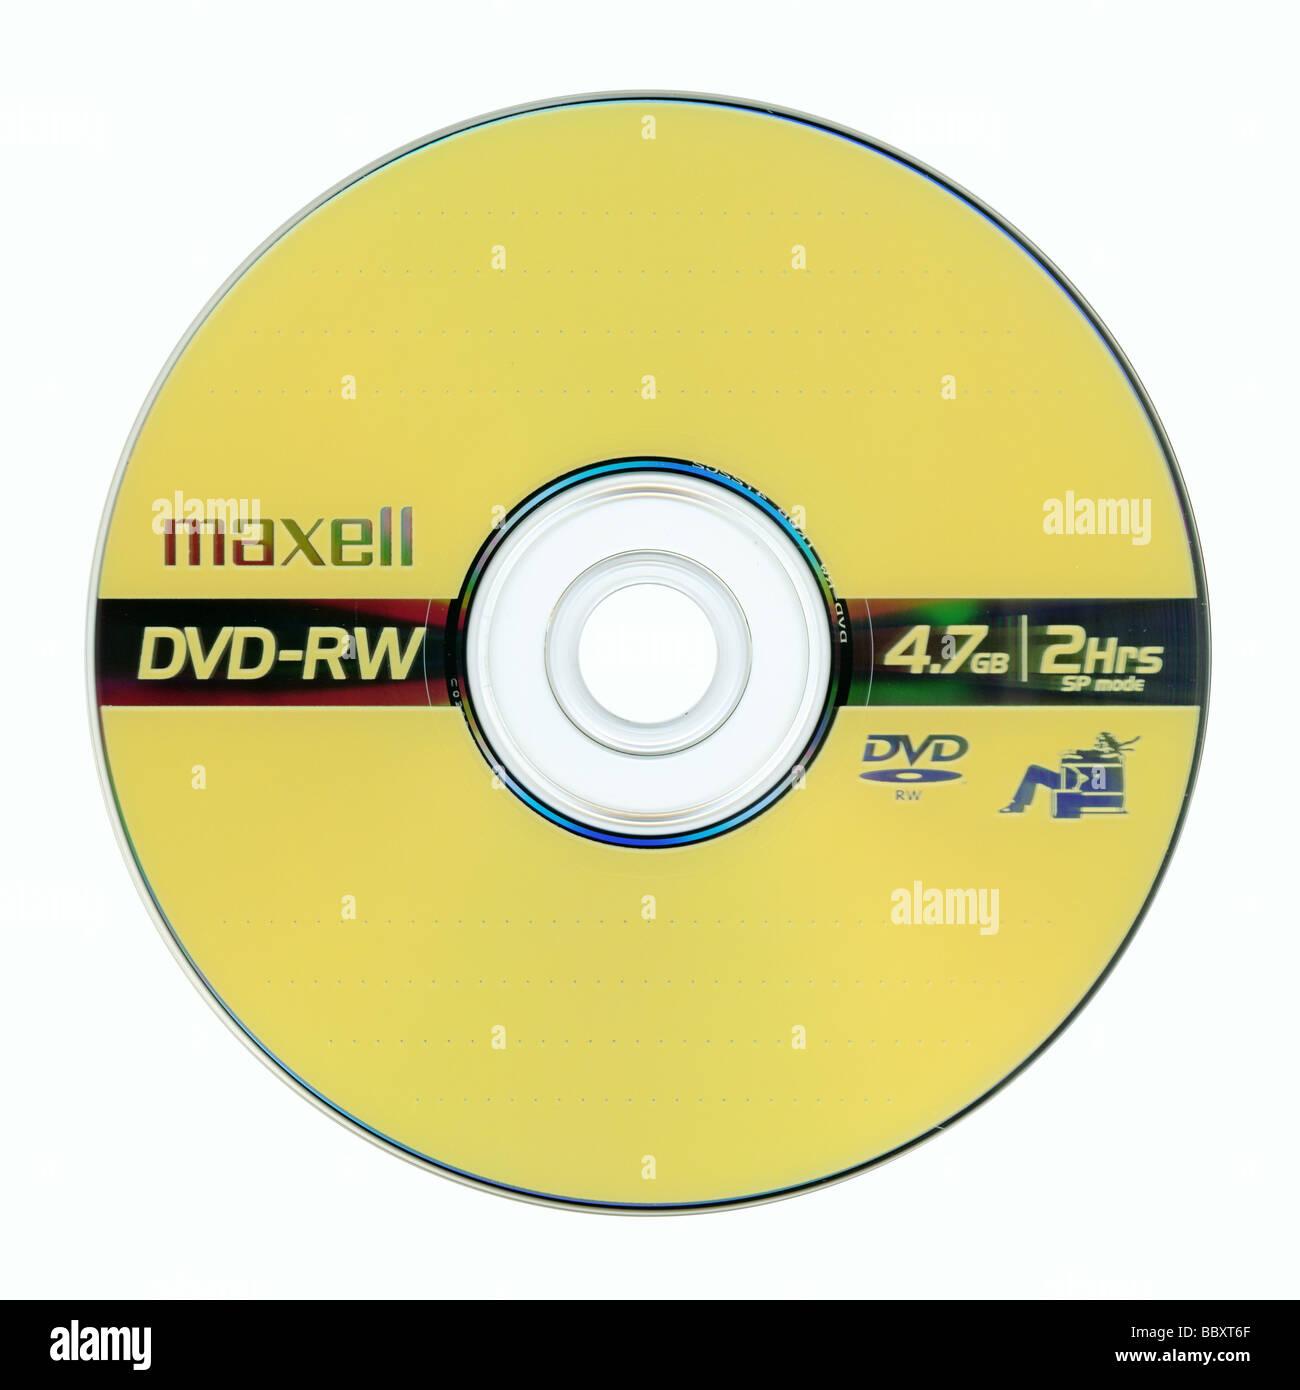 single sided DVD-RW - Stock Image